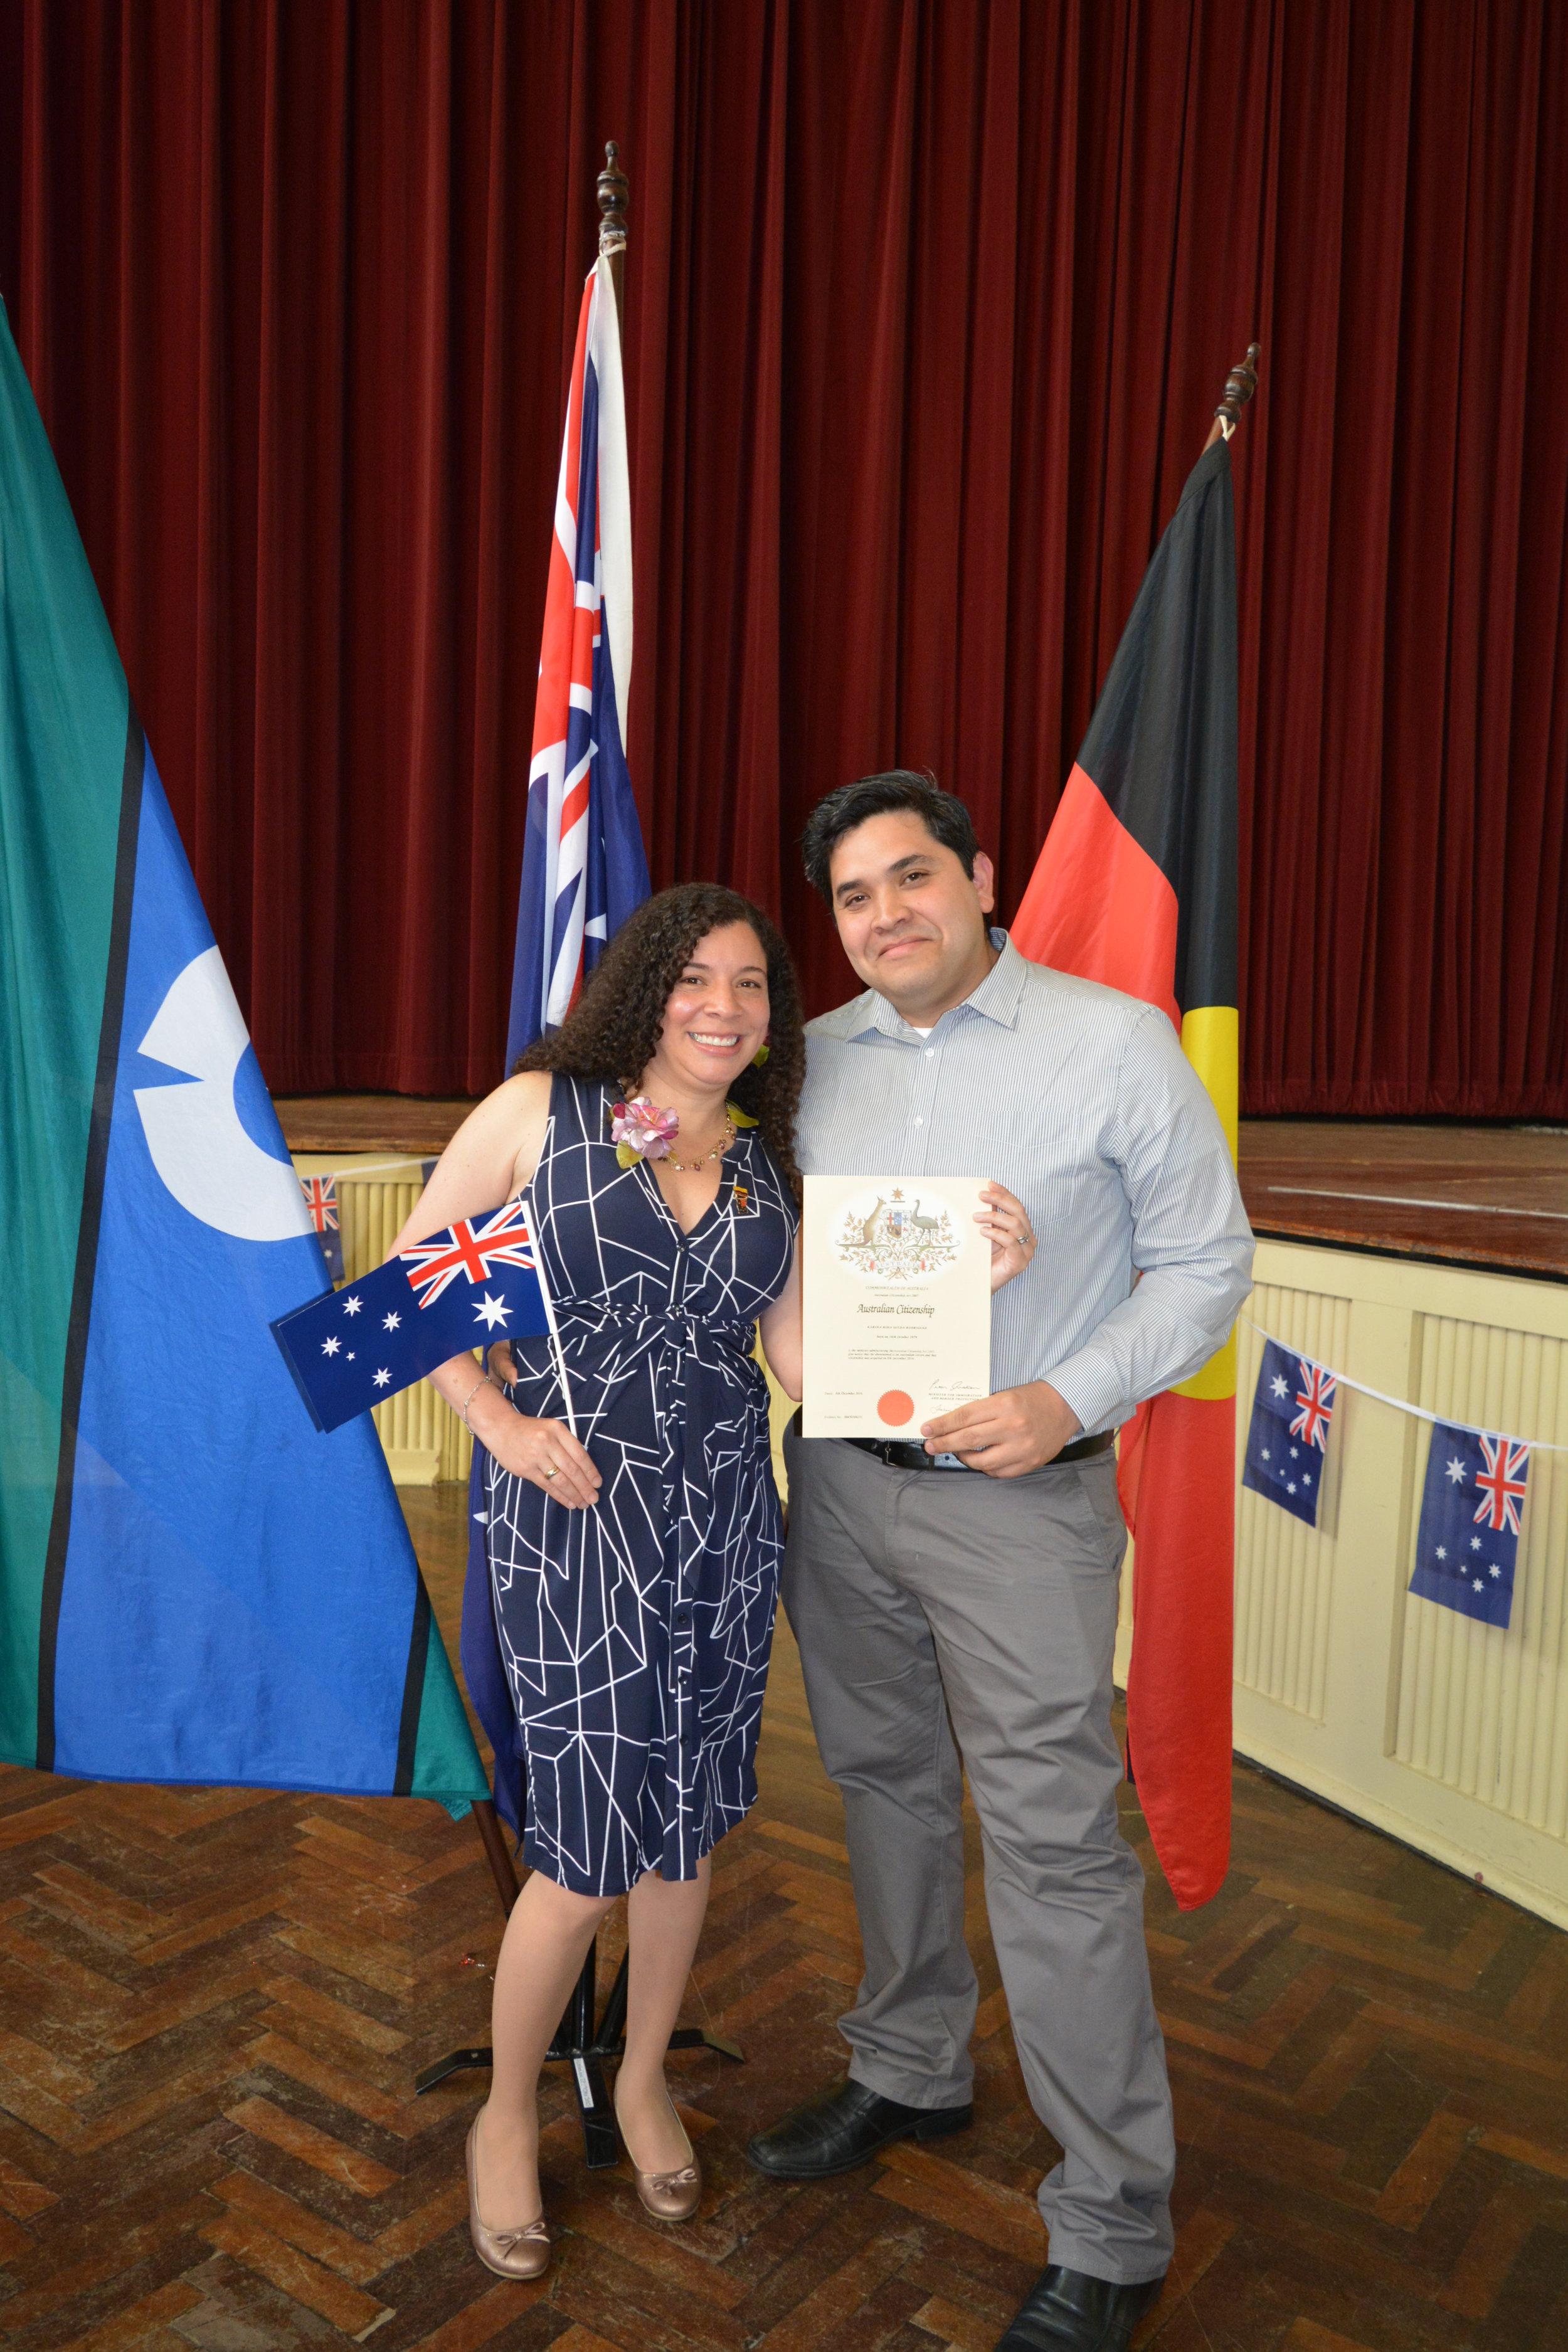 Karina and Juan David at her Australian Citizen ceremony in December 2016